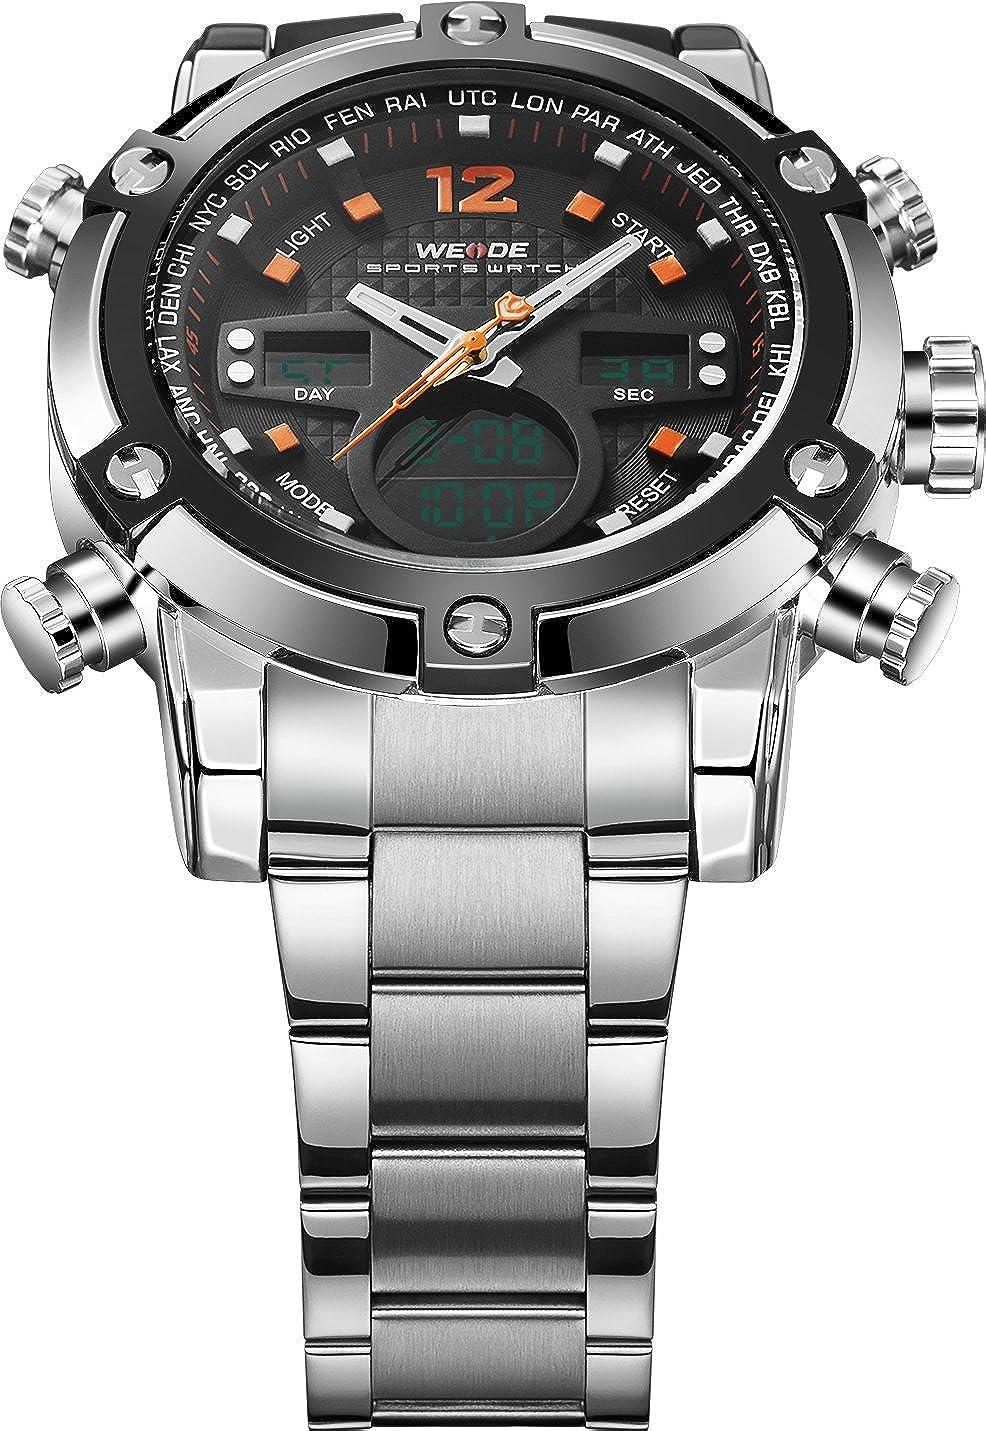 Amazon.com: Weide Mens Fashion Sport Military LED Analog Digital Stainless Steel Quartz Wrist Watch (Orange): Watches